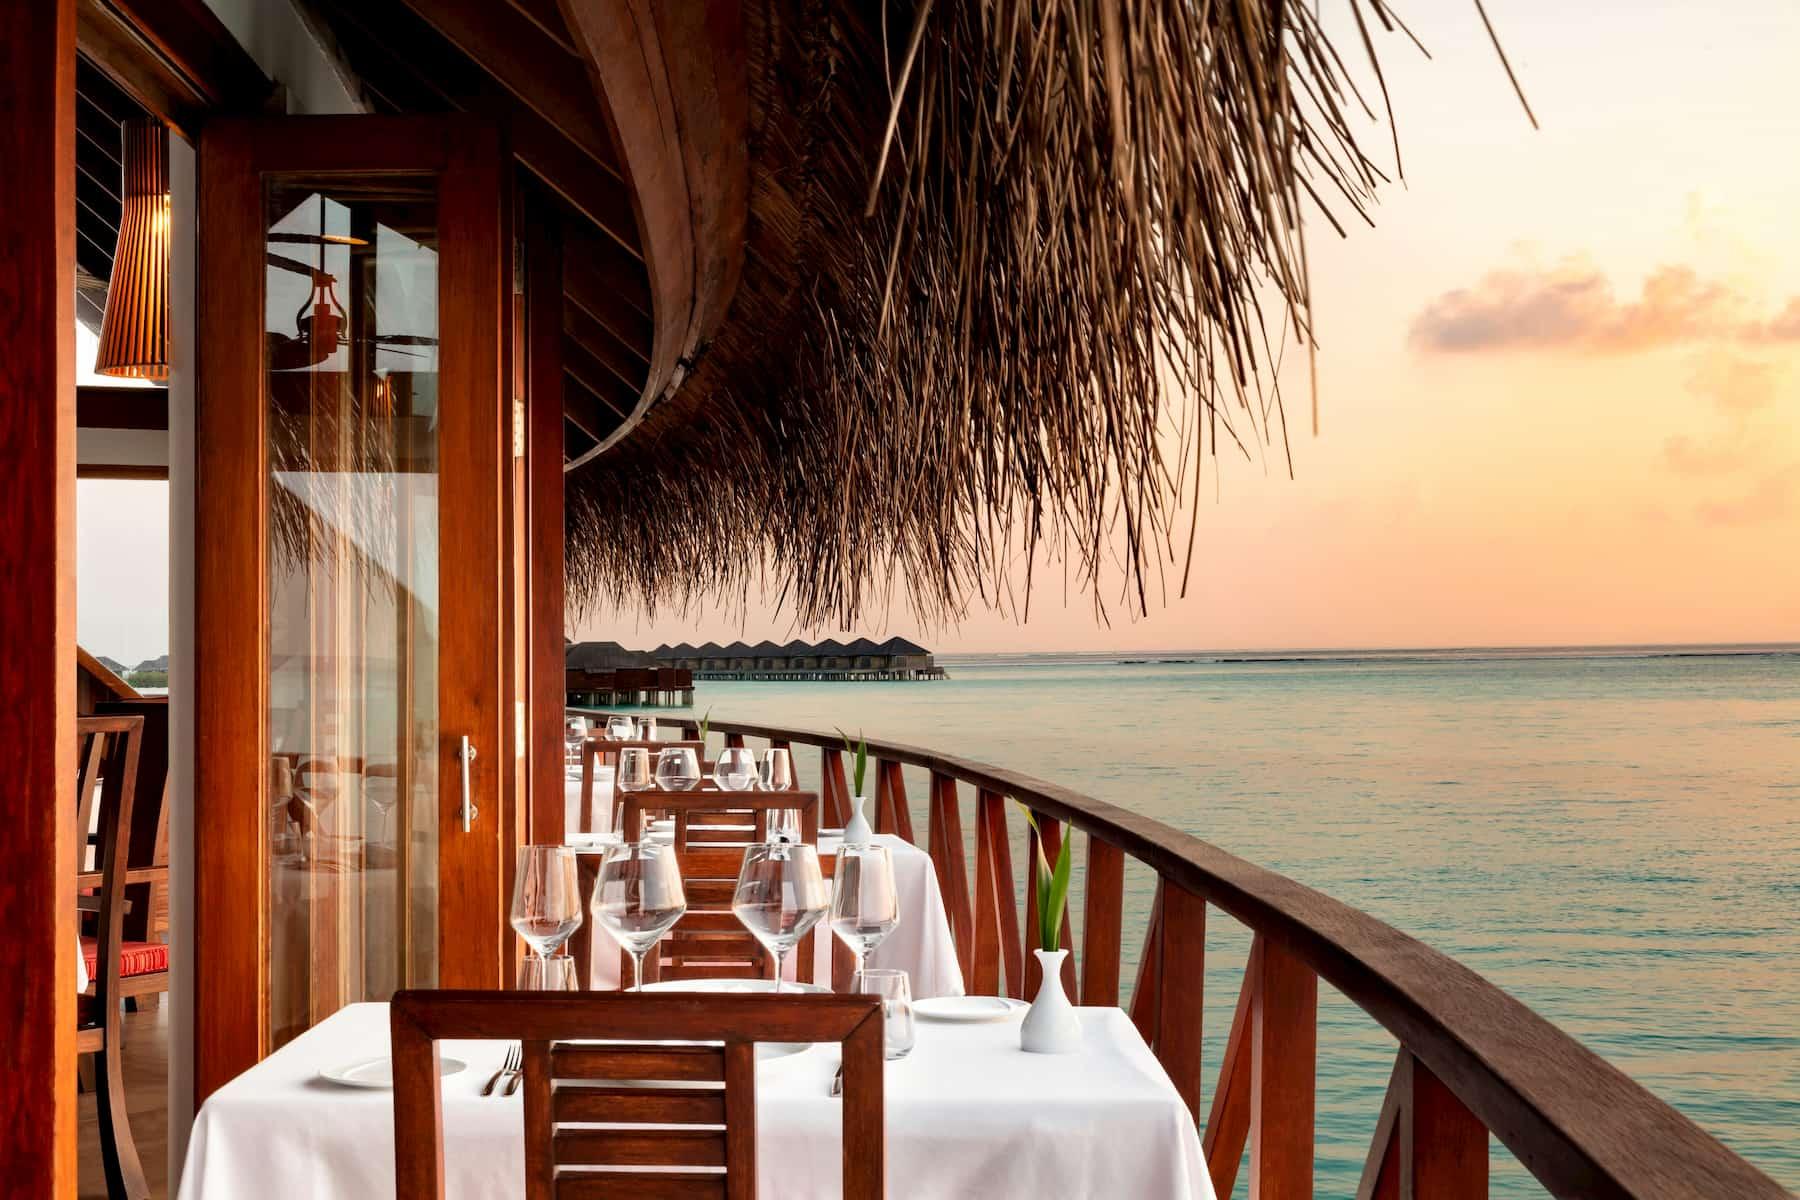 Anantara Dhigu resort Maldive ristorante terrazzo cucina italiana